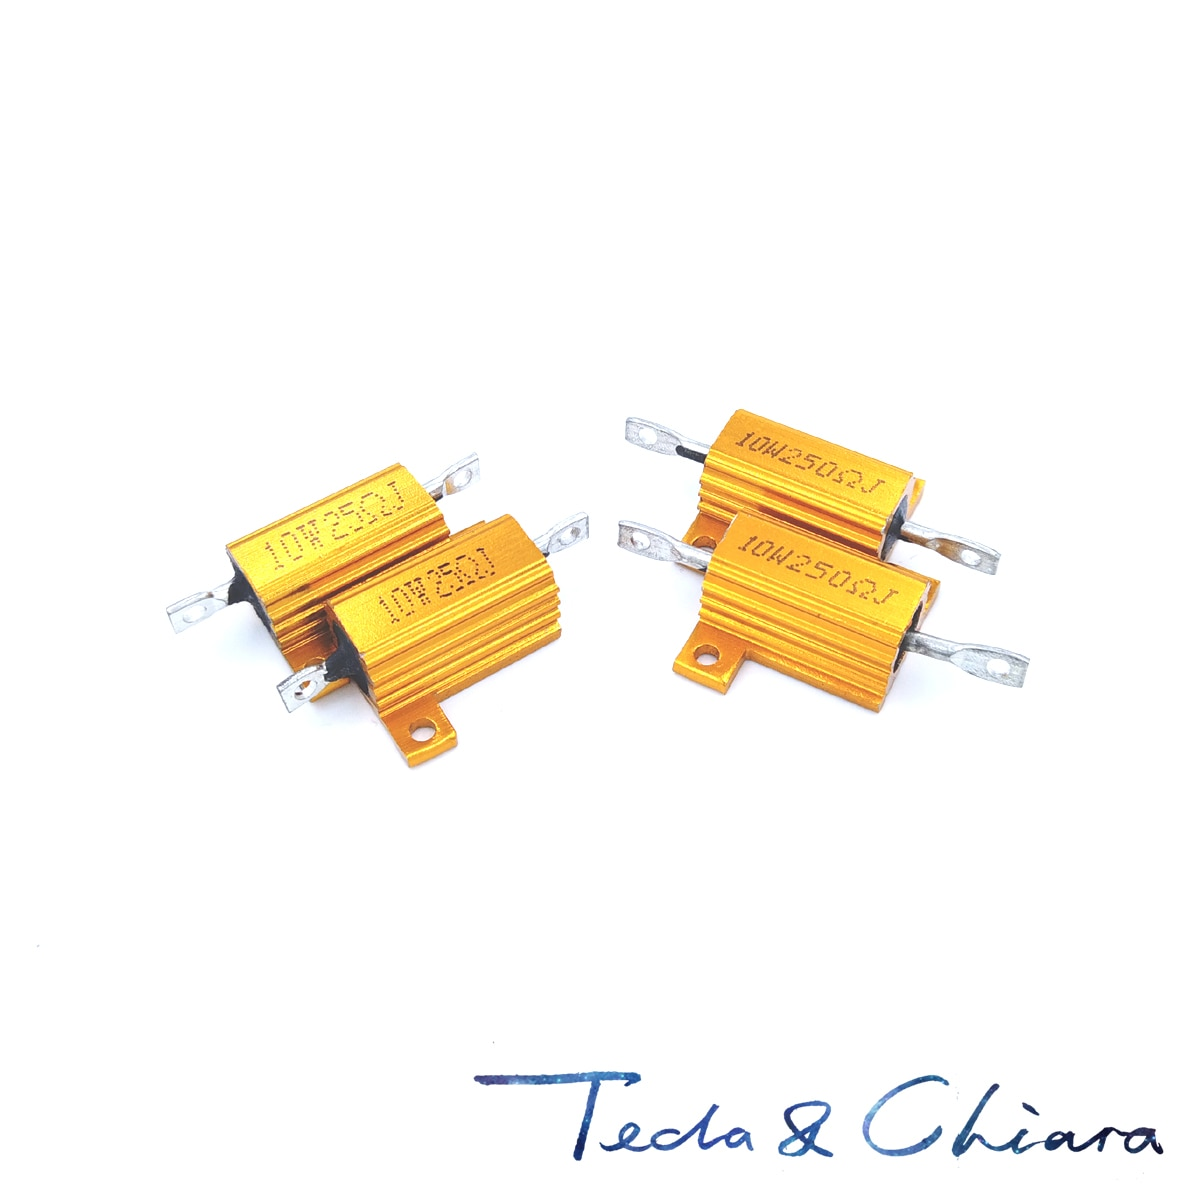 5 uds 4.7R 4,7 4.7ohm 47R 47 47ohm R Ohm 10W tono dorado bobinado aluminio potencia Metal carcasa resistencia Resistor RX24